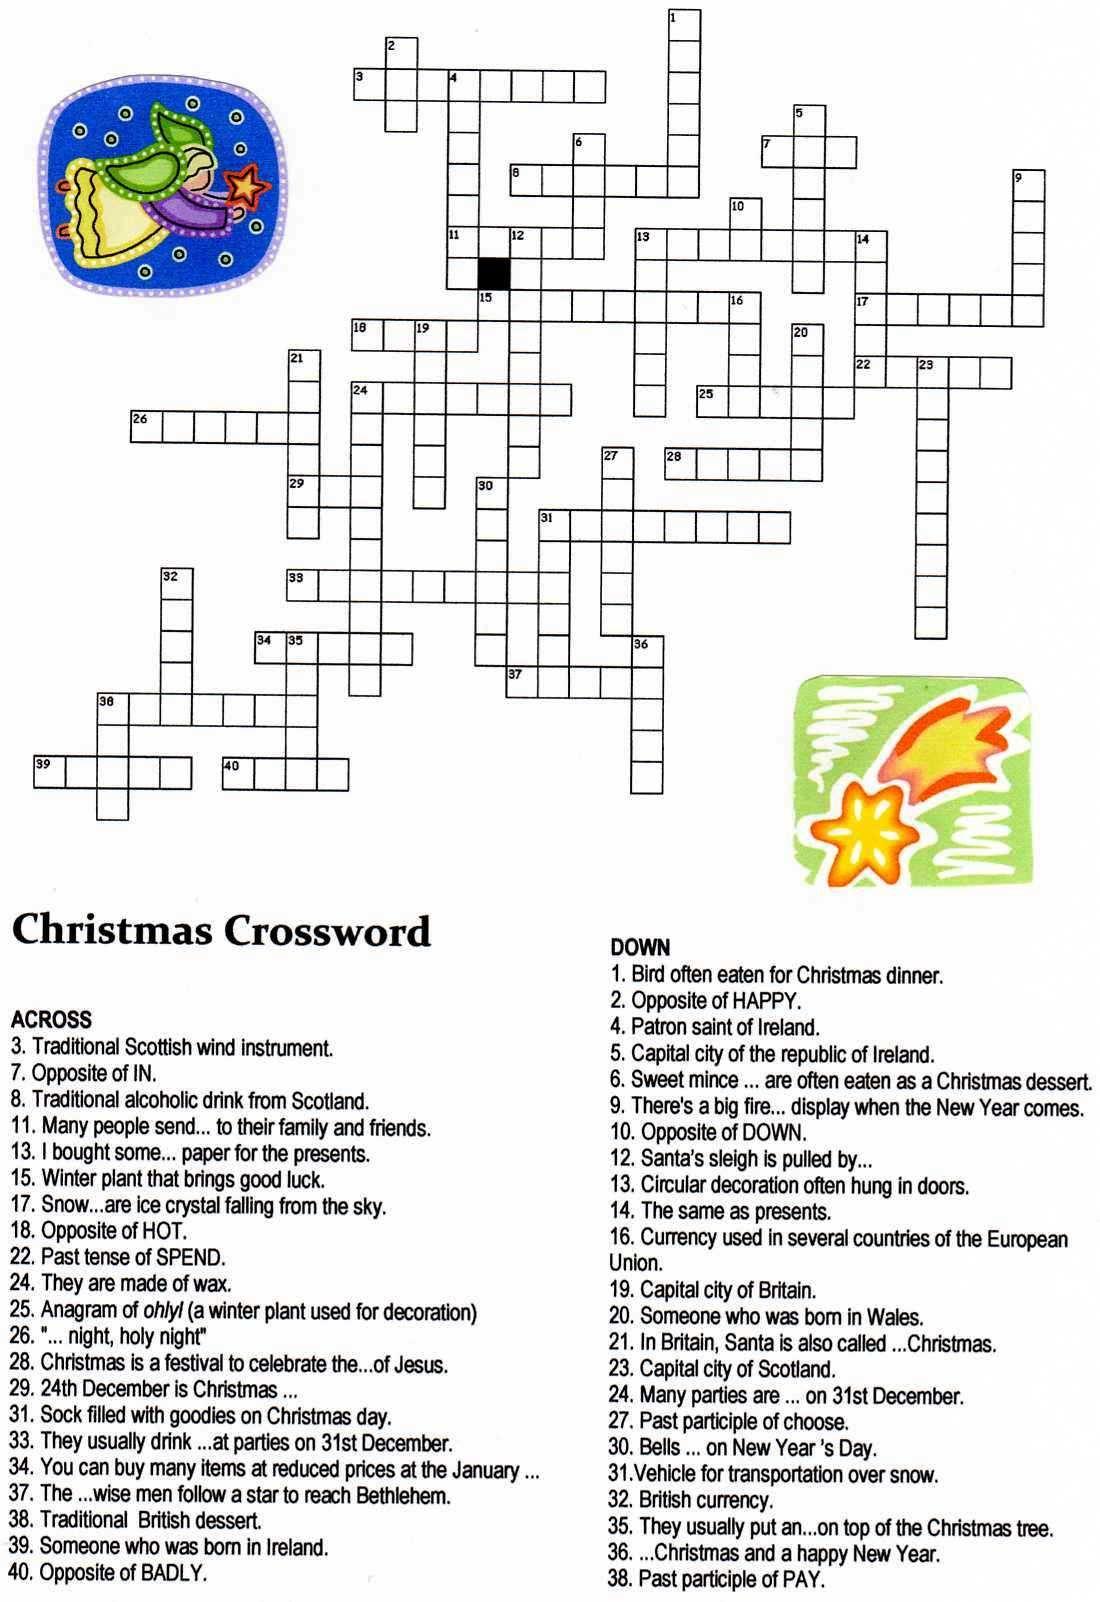 Christmas Angel Crossword Puzzle | Christmas | Christmas Crossword - Printable Hanukkah Crossword Puzzles